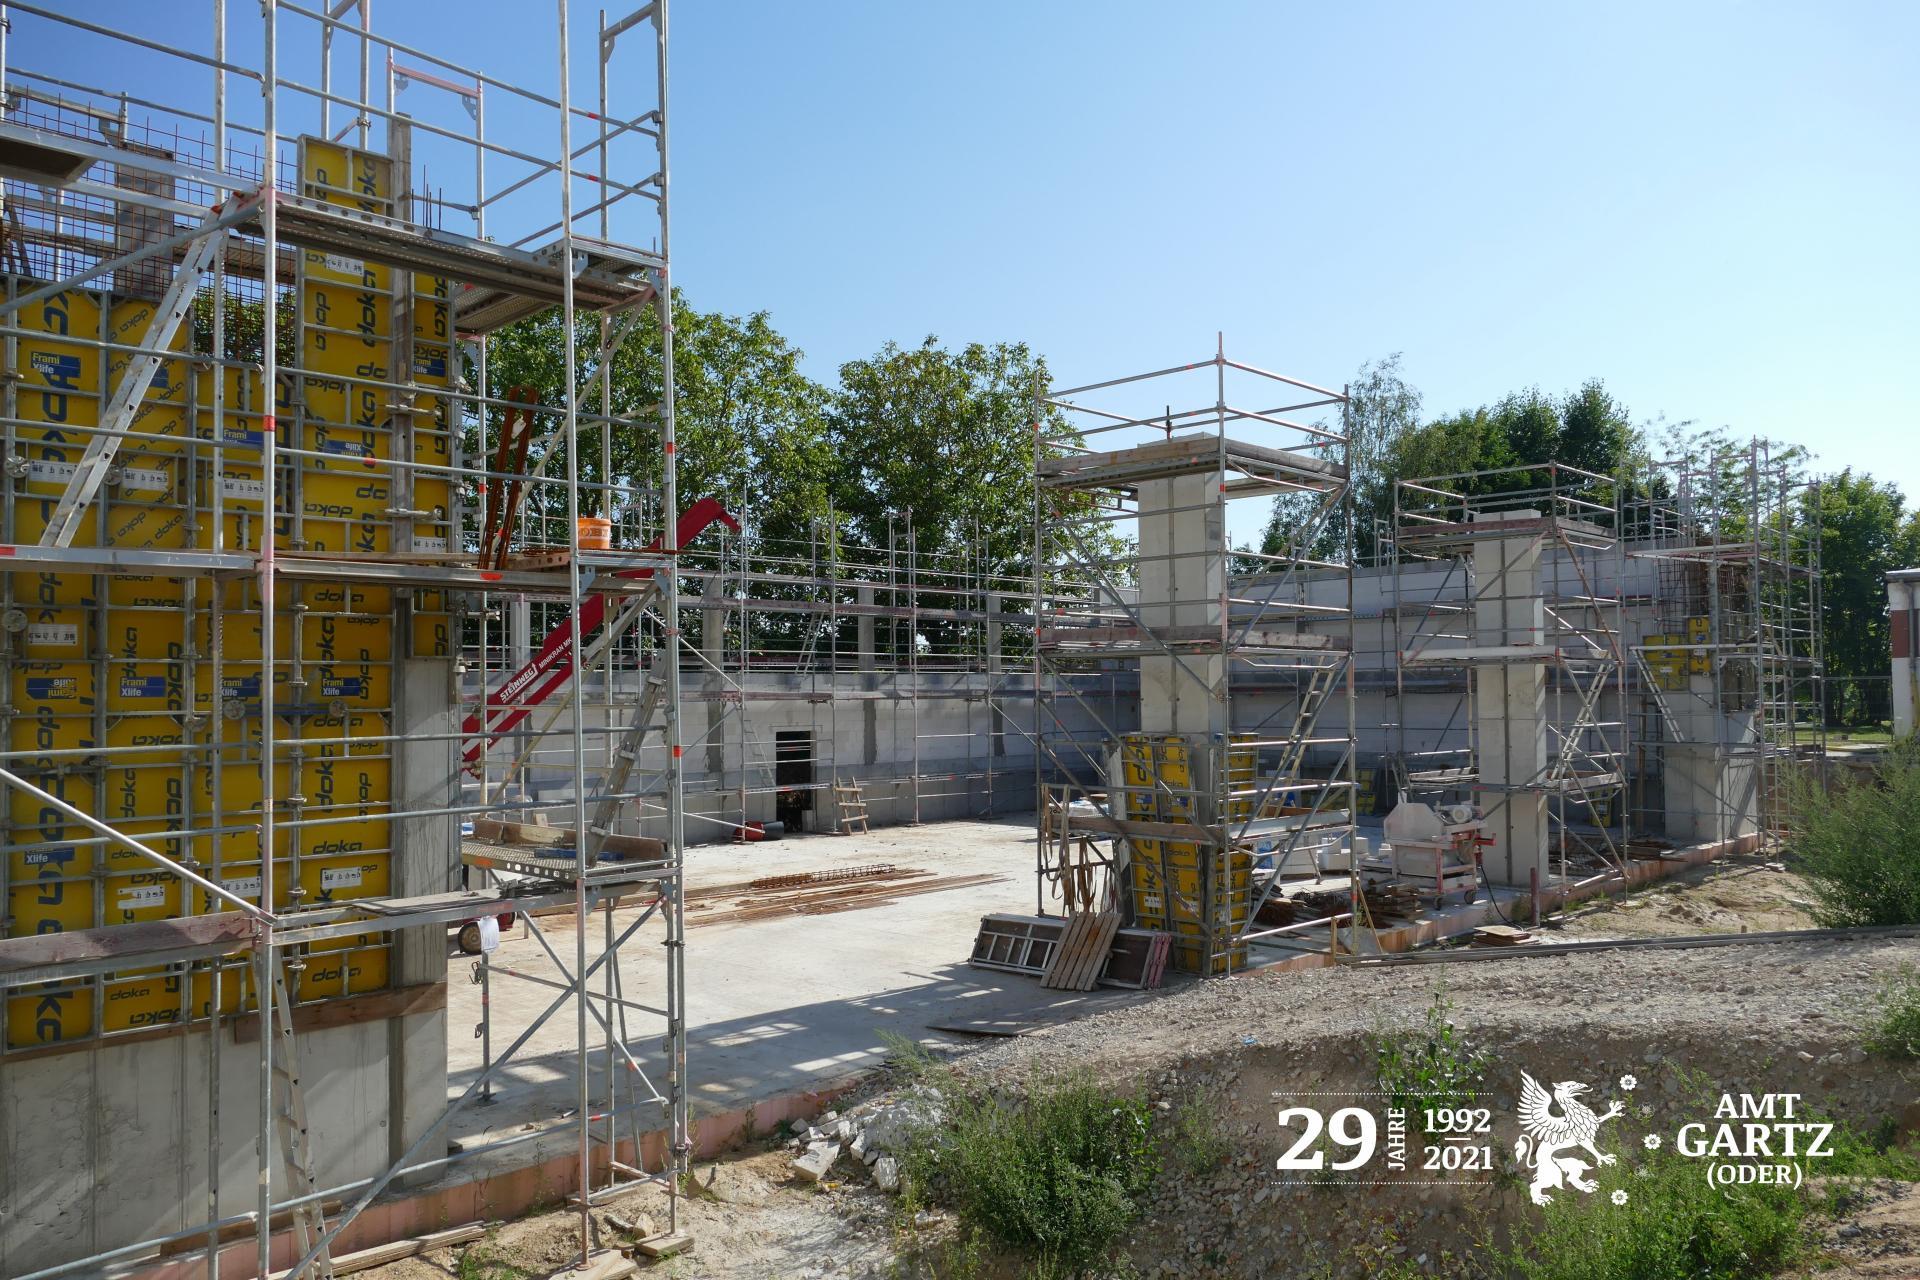 Baustelle Grundschule Gartz (Oder)